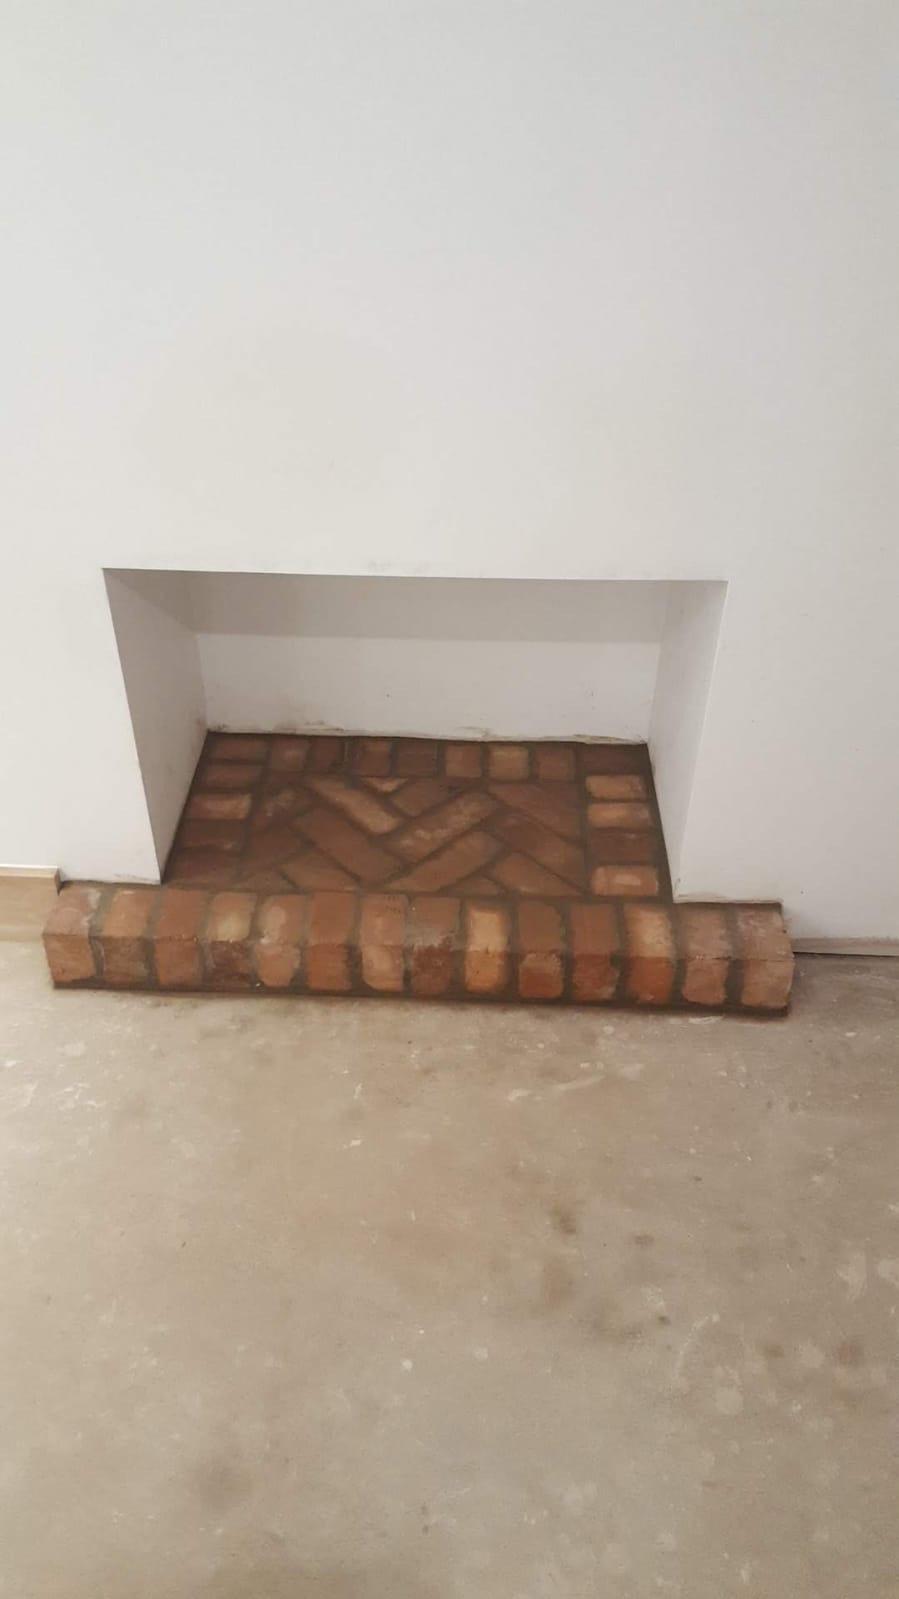 Brick fireplace hearth